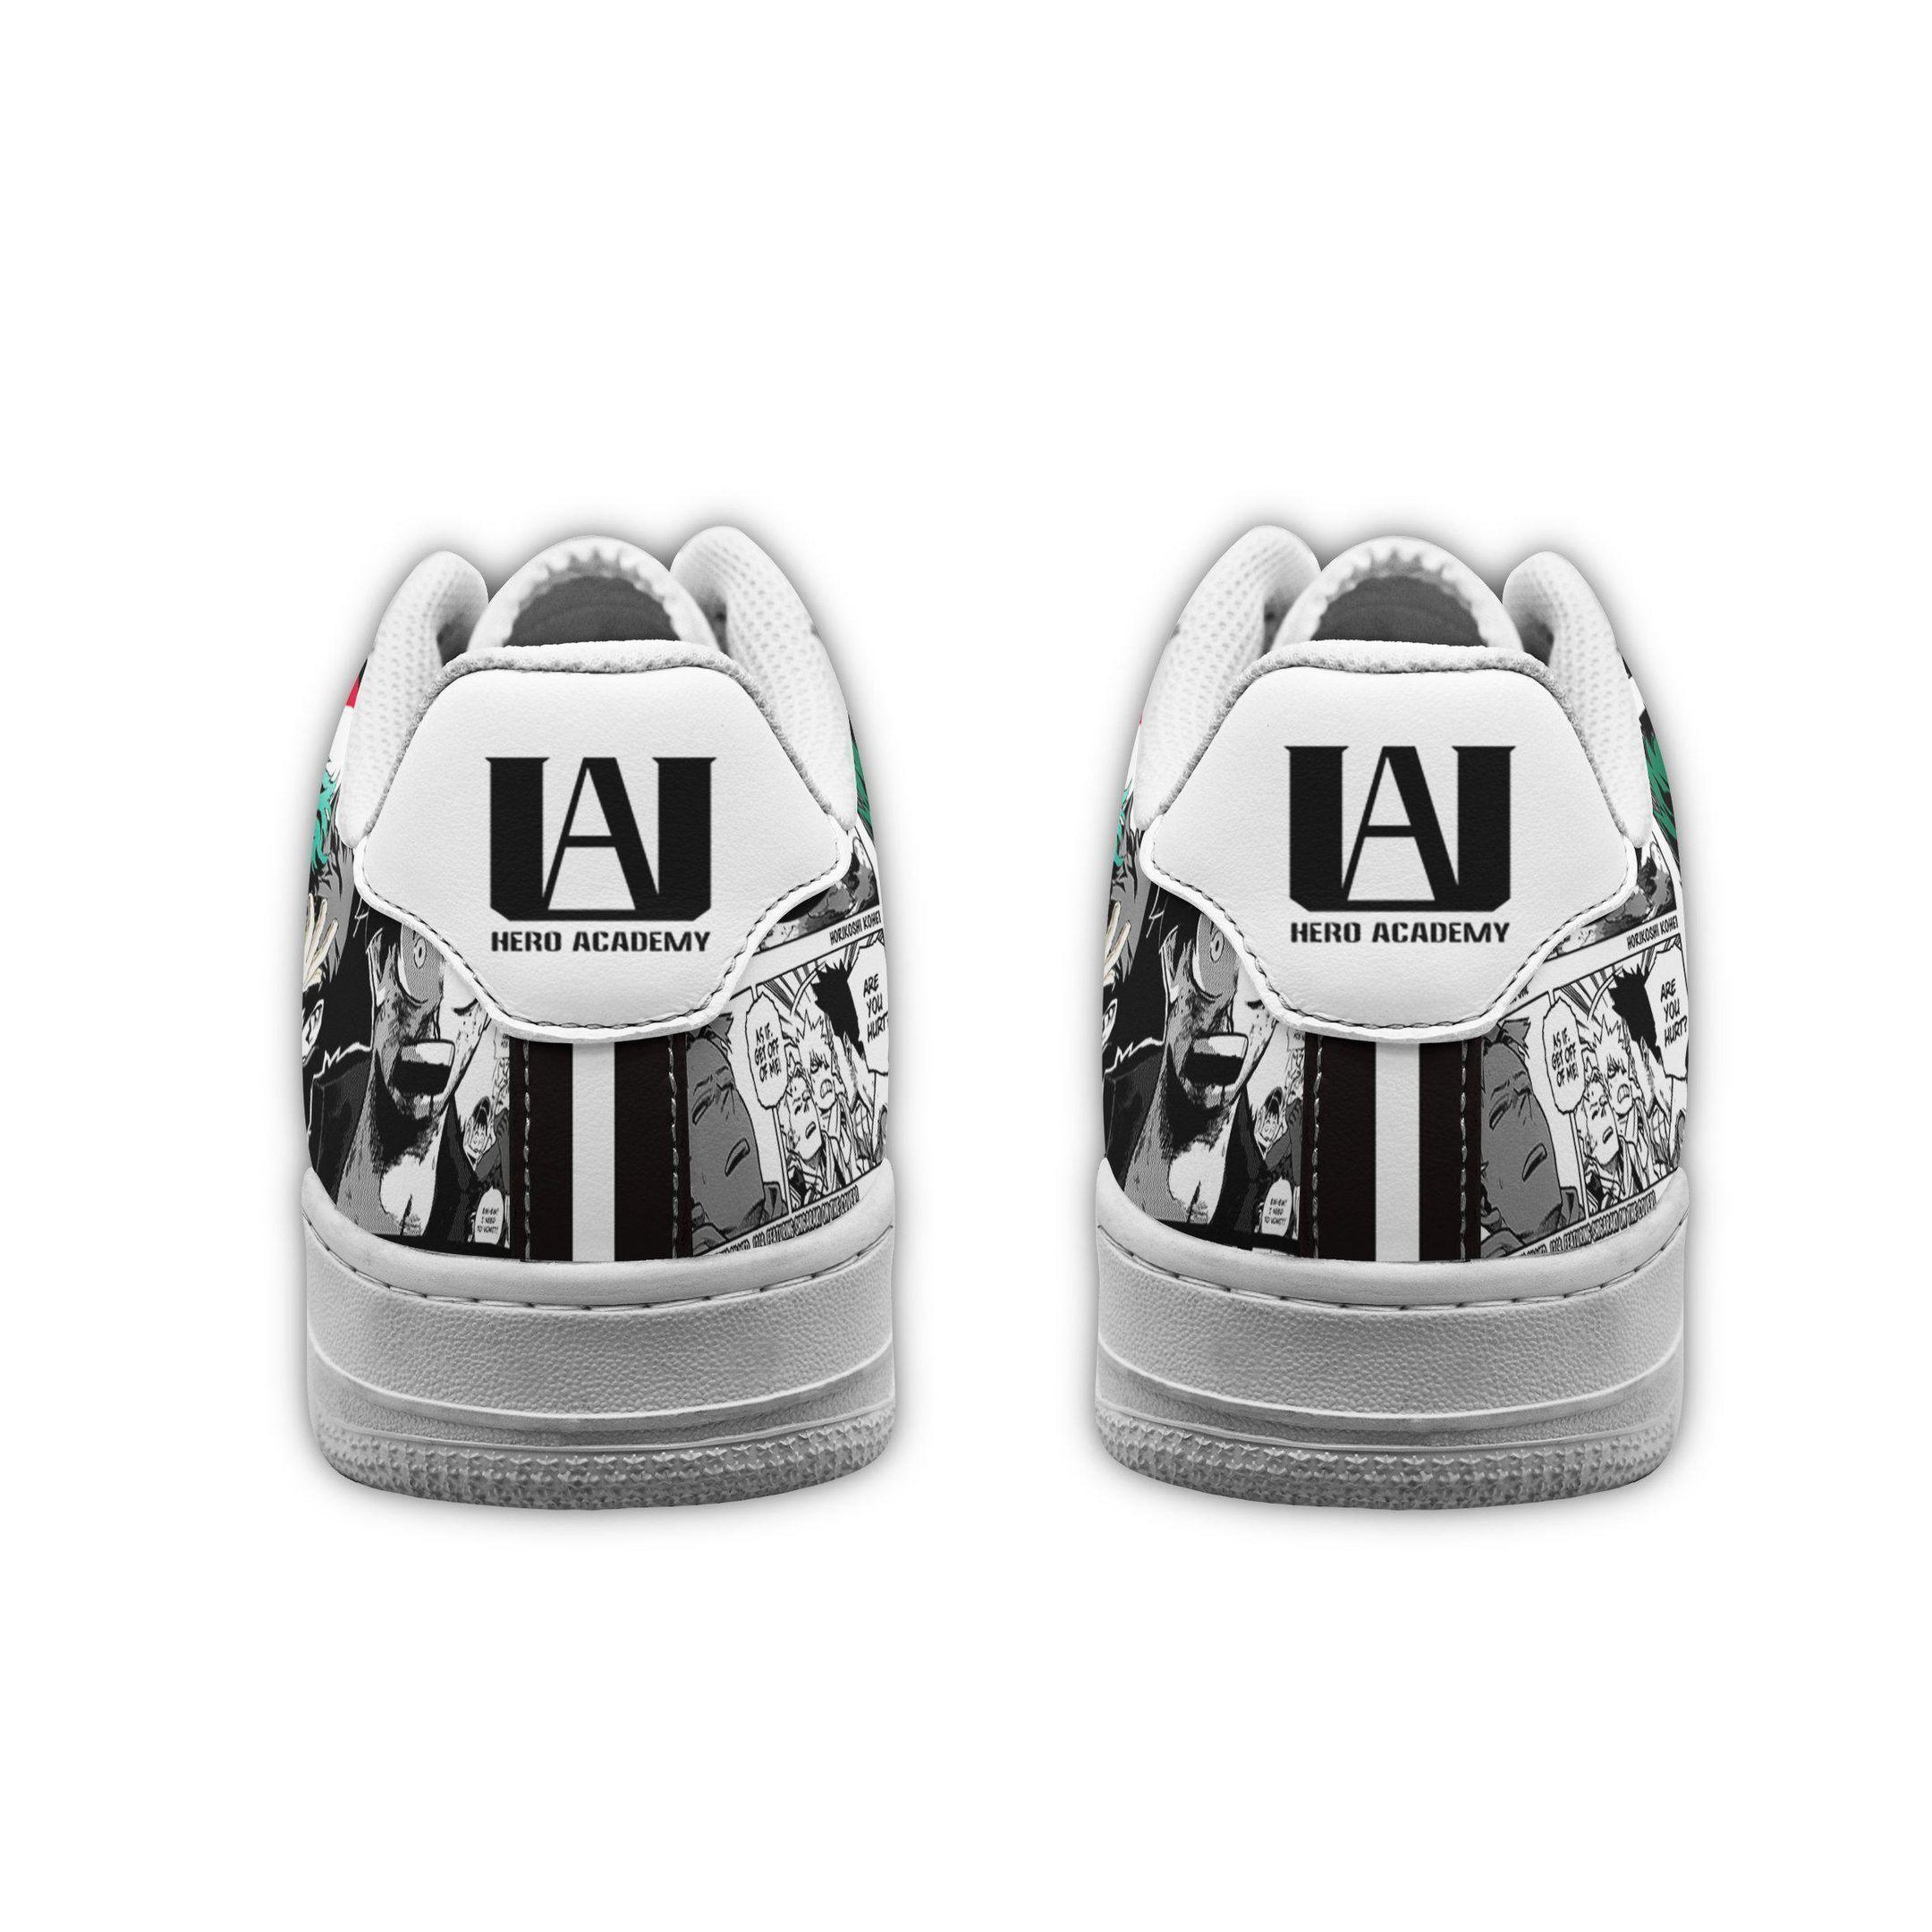 My Hero Academia Air Shoes Manga Mix Anime Shoes Fan Gift Idea GO1012